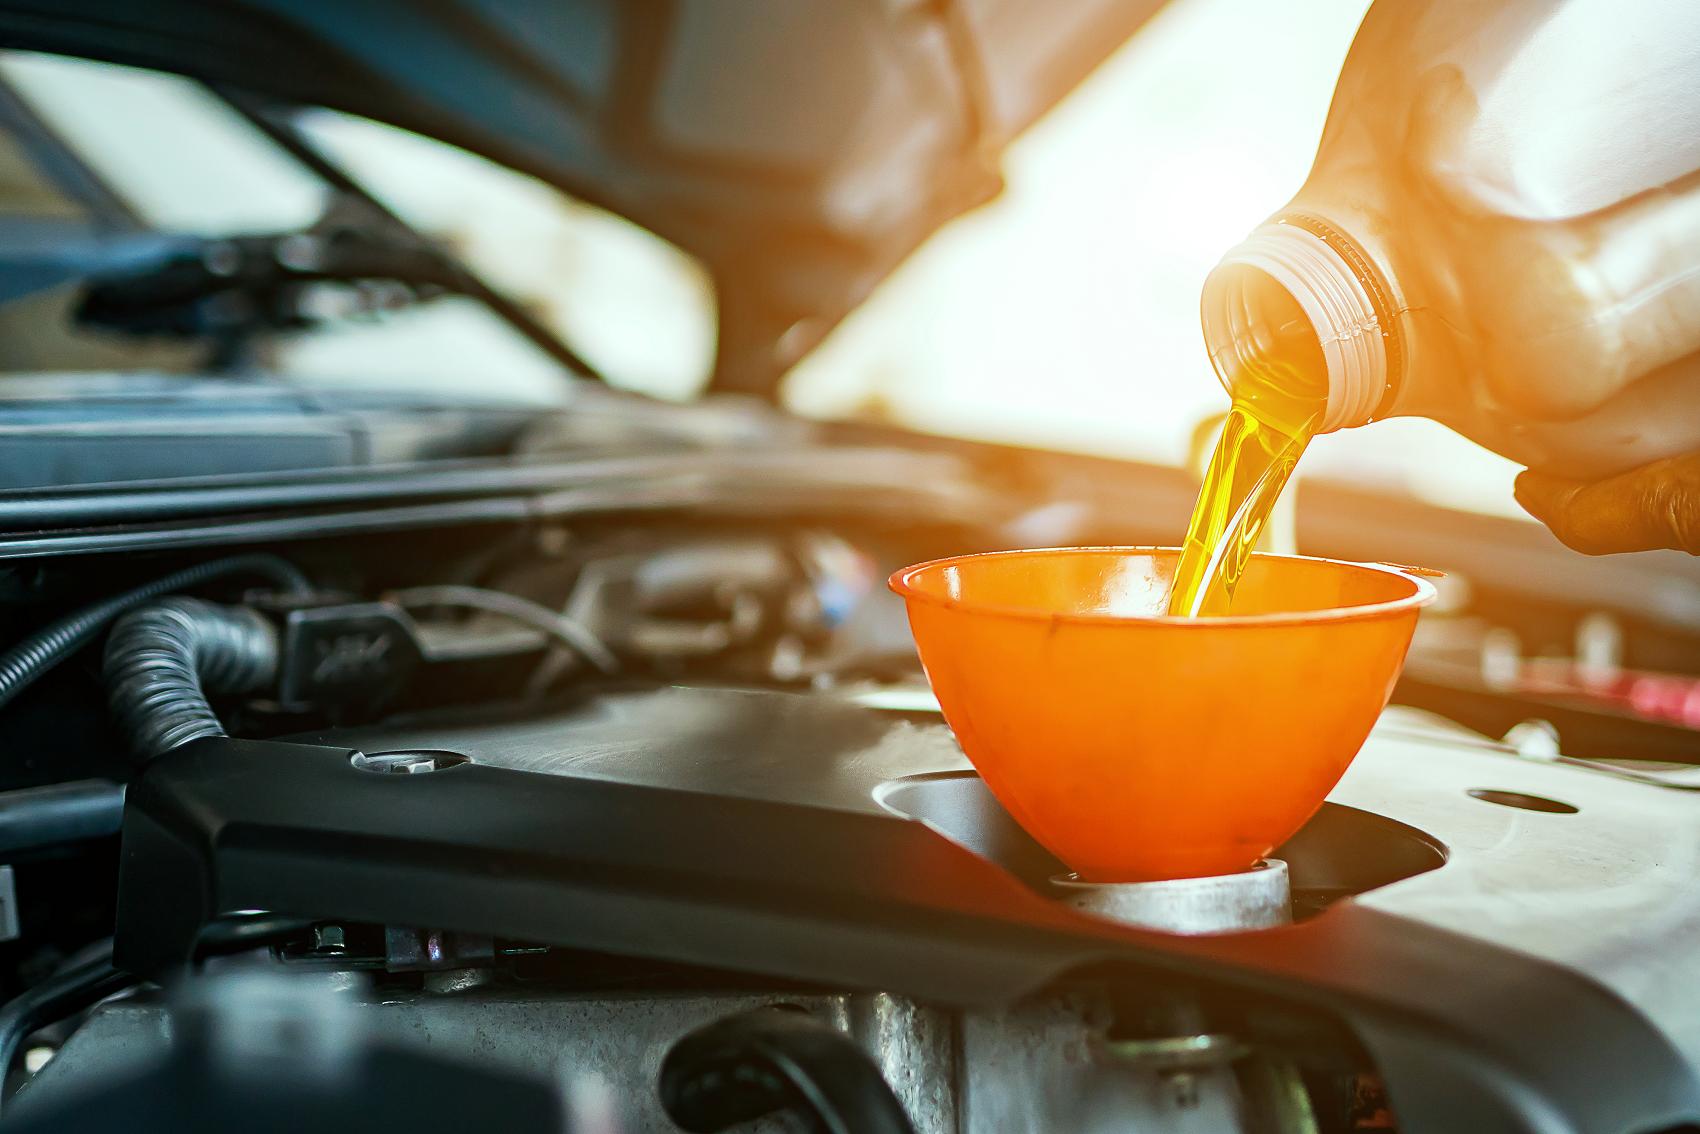 how often should I change my oil